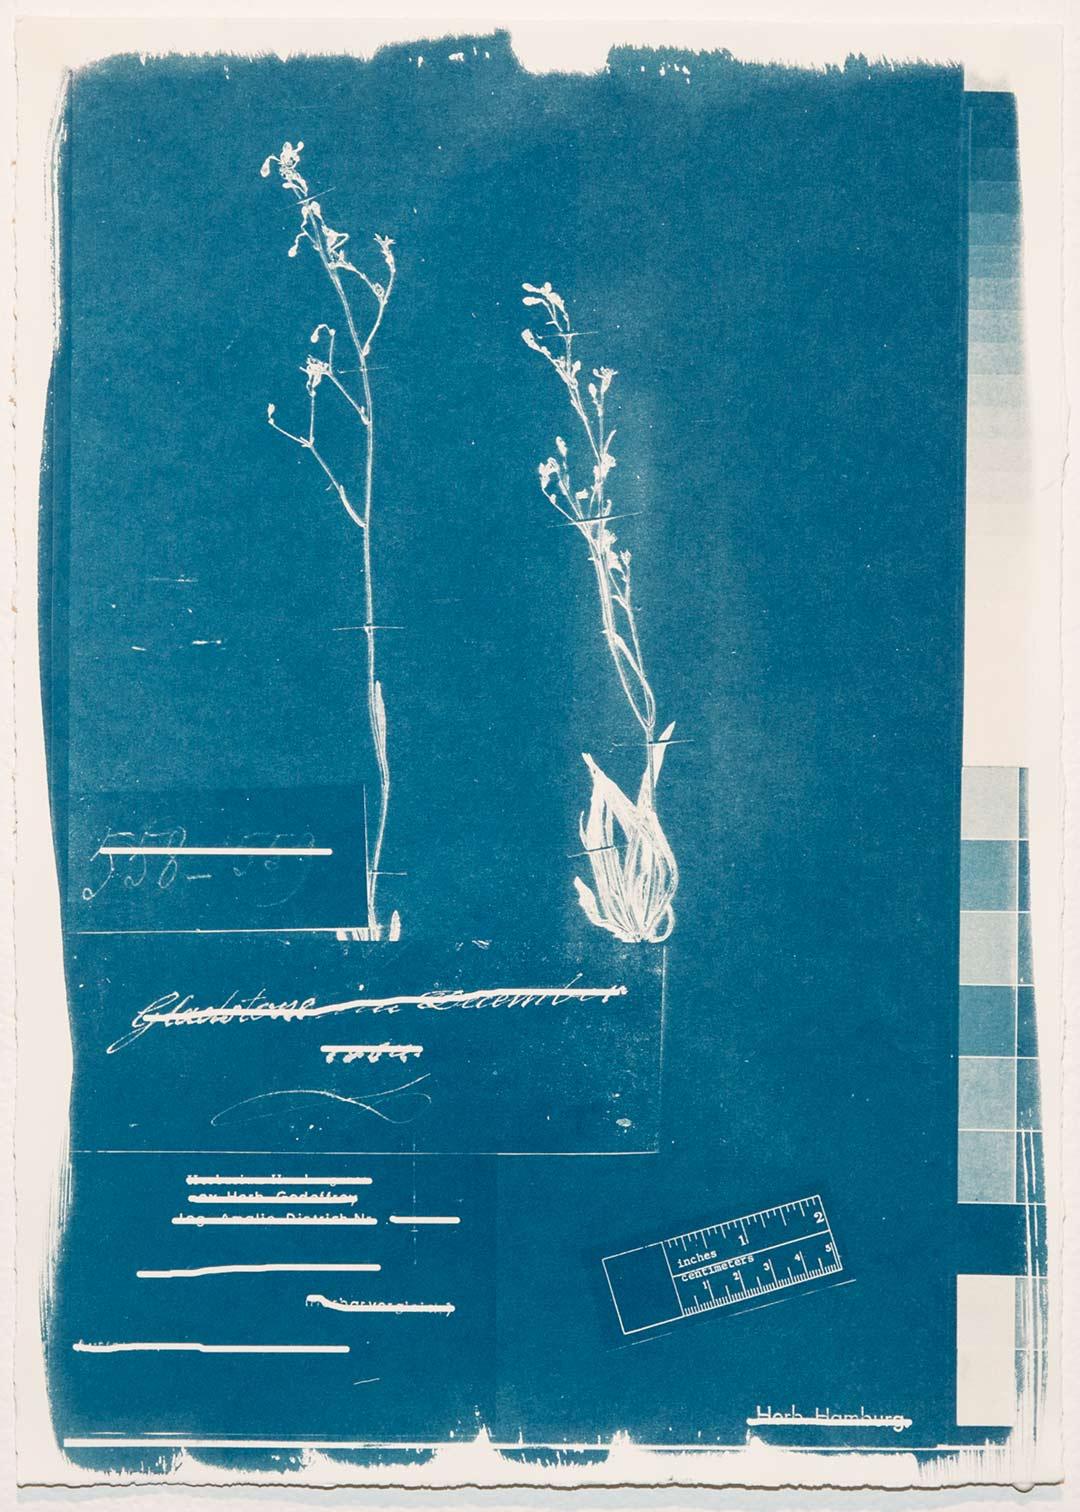 <b>Herbarium Hamburgense 2016-2017</b><br /> Cyanotypes on Canson Edition, edition of 10, each image 30 x 42 cm.